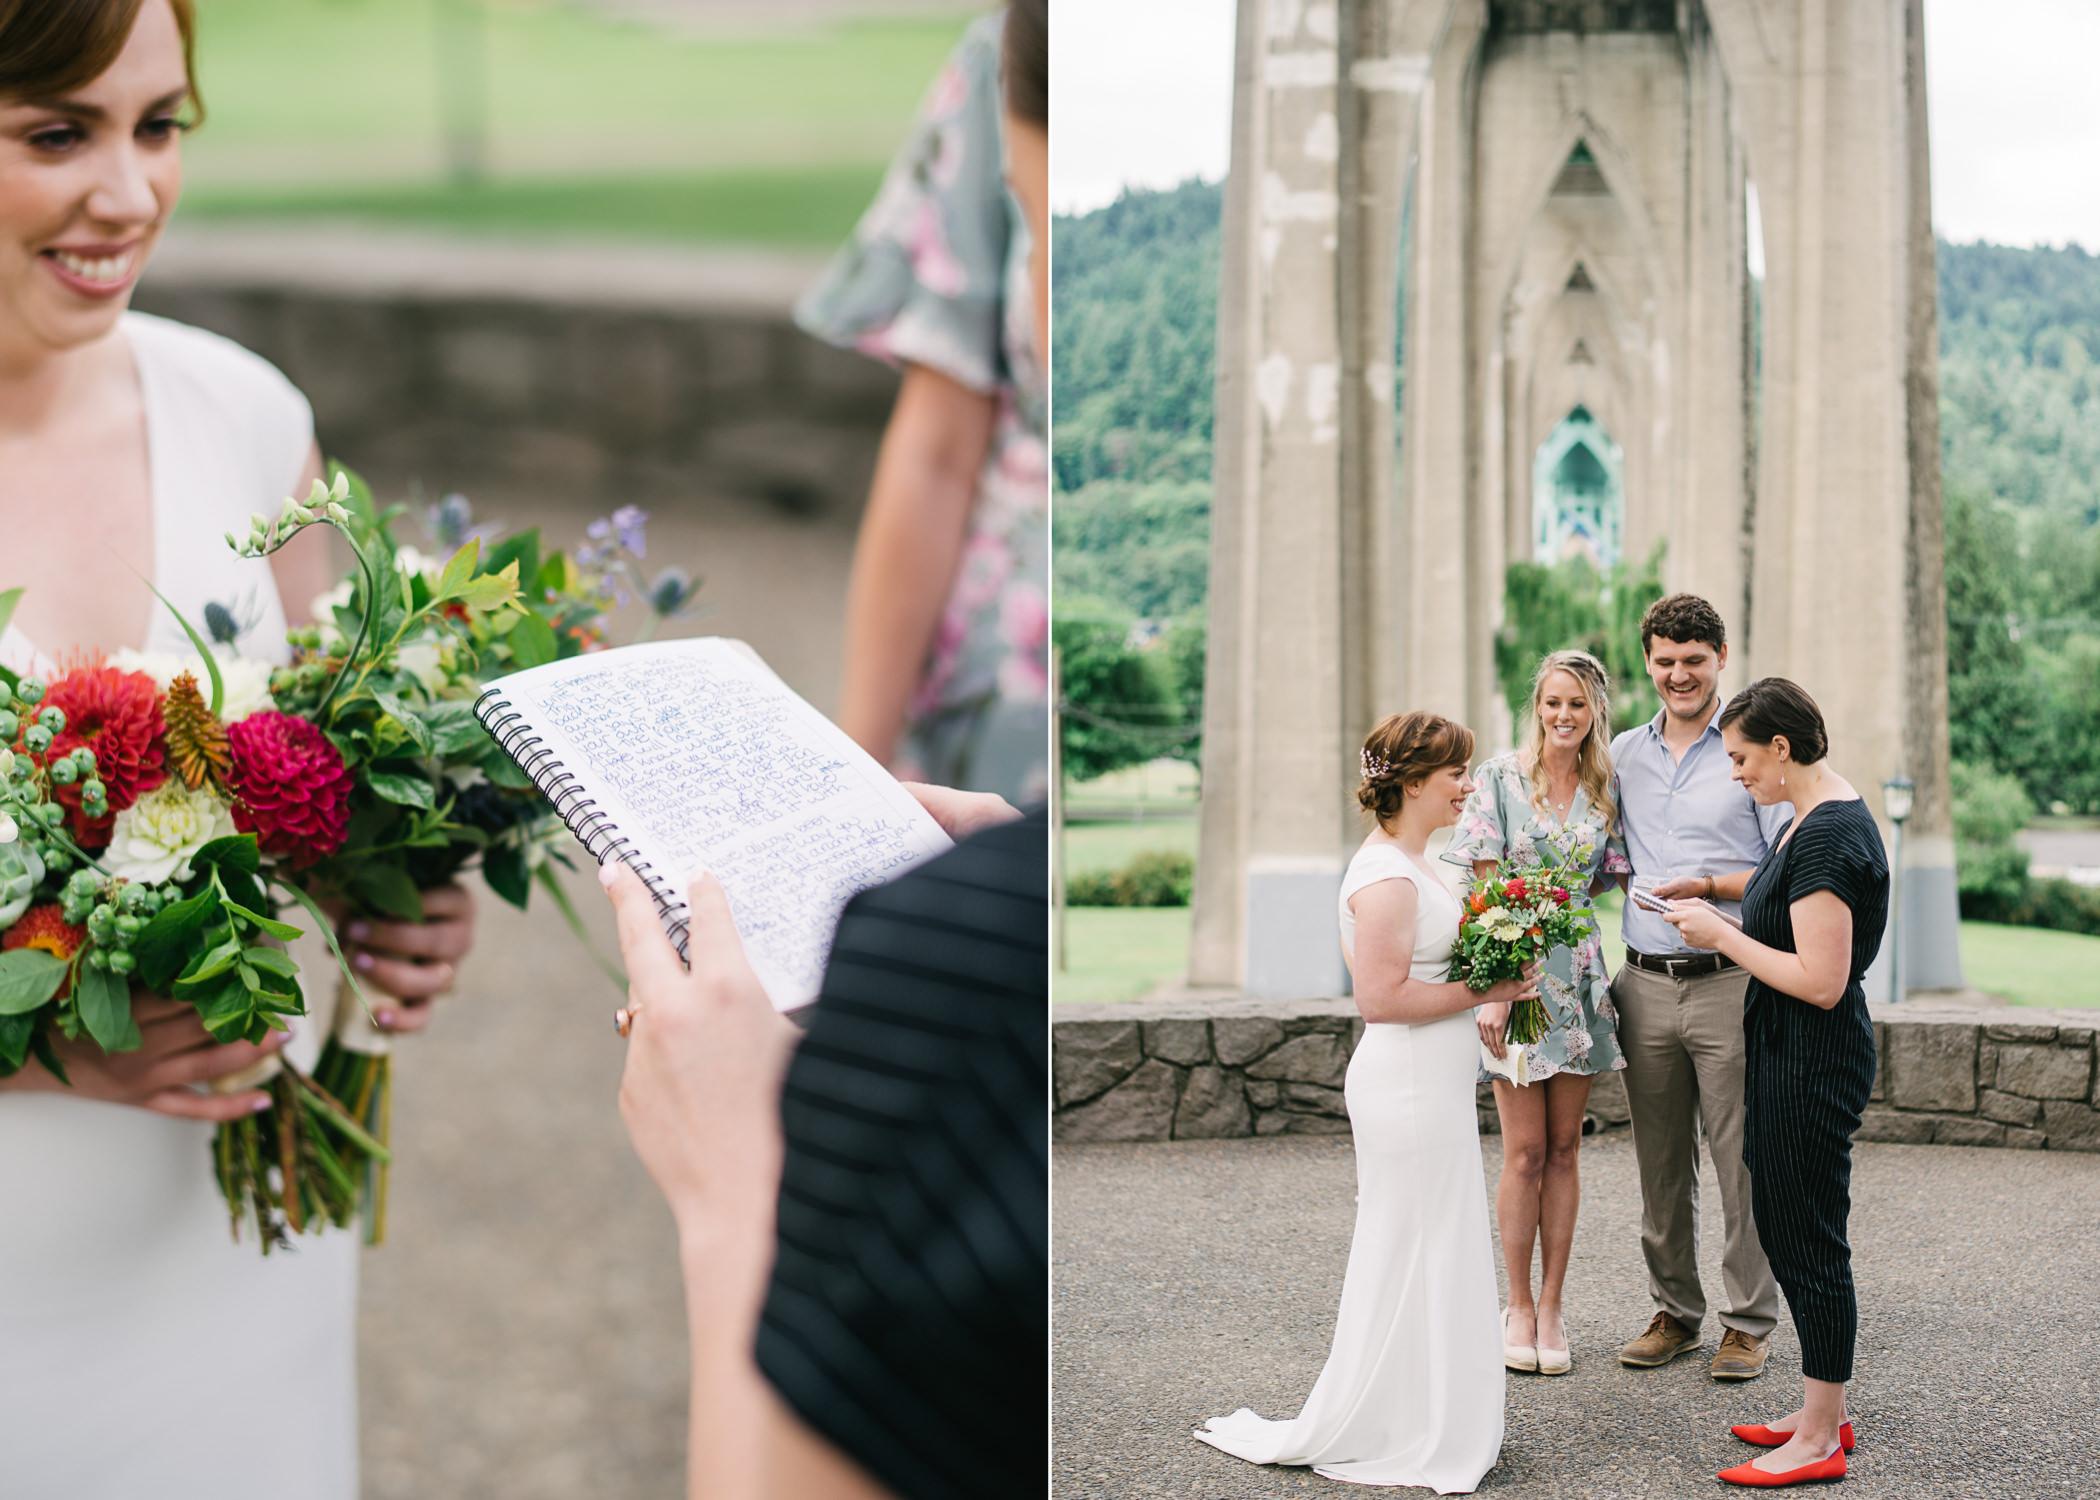 cathedral-park-portland-elopement-gay-wedding-024.JPG